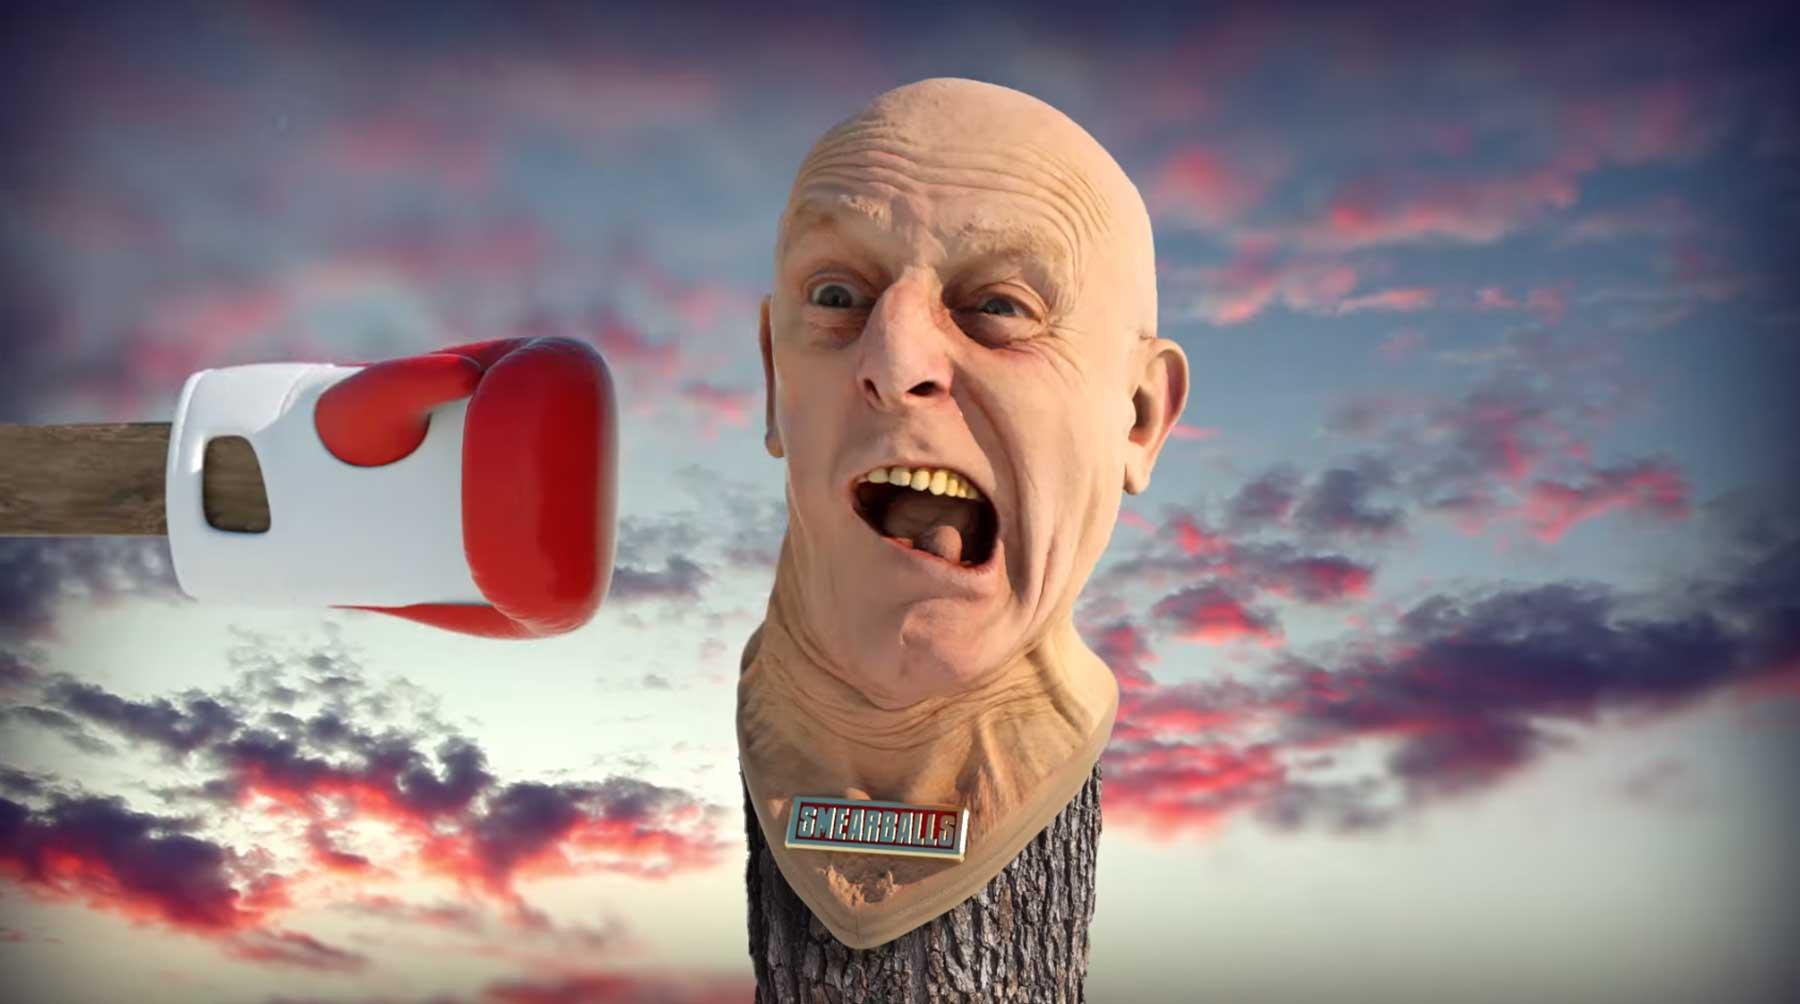 Abgefuckt-surreal-lustige WTF?!-Animation